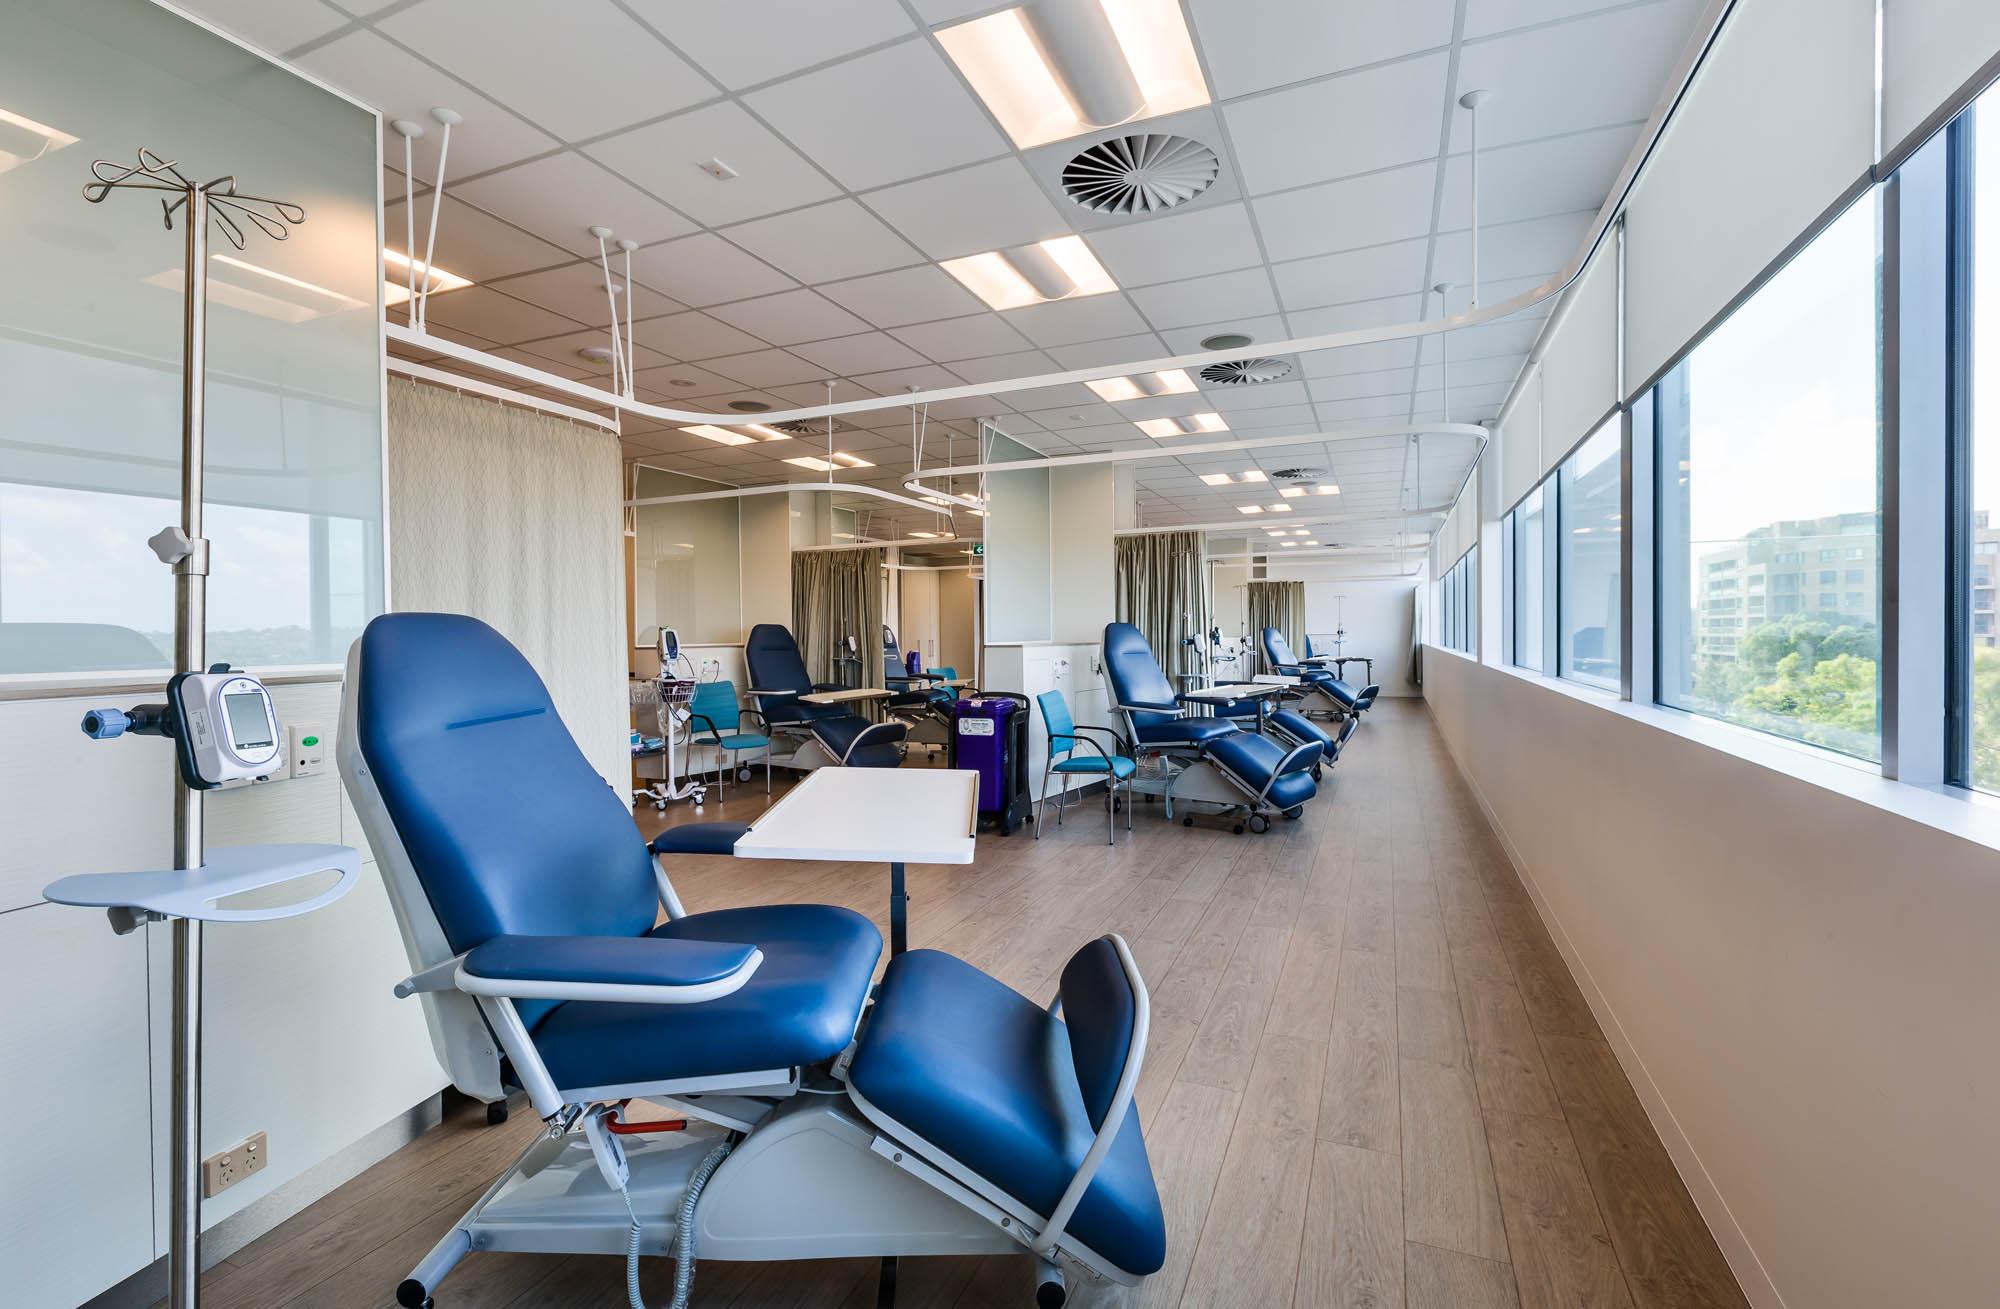 southside cancer care hospital fitout sydney patient treatment blue chairs